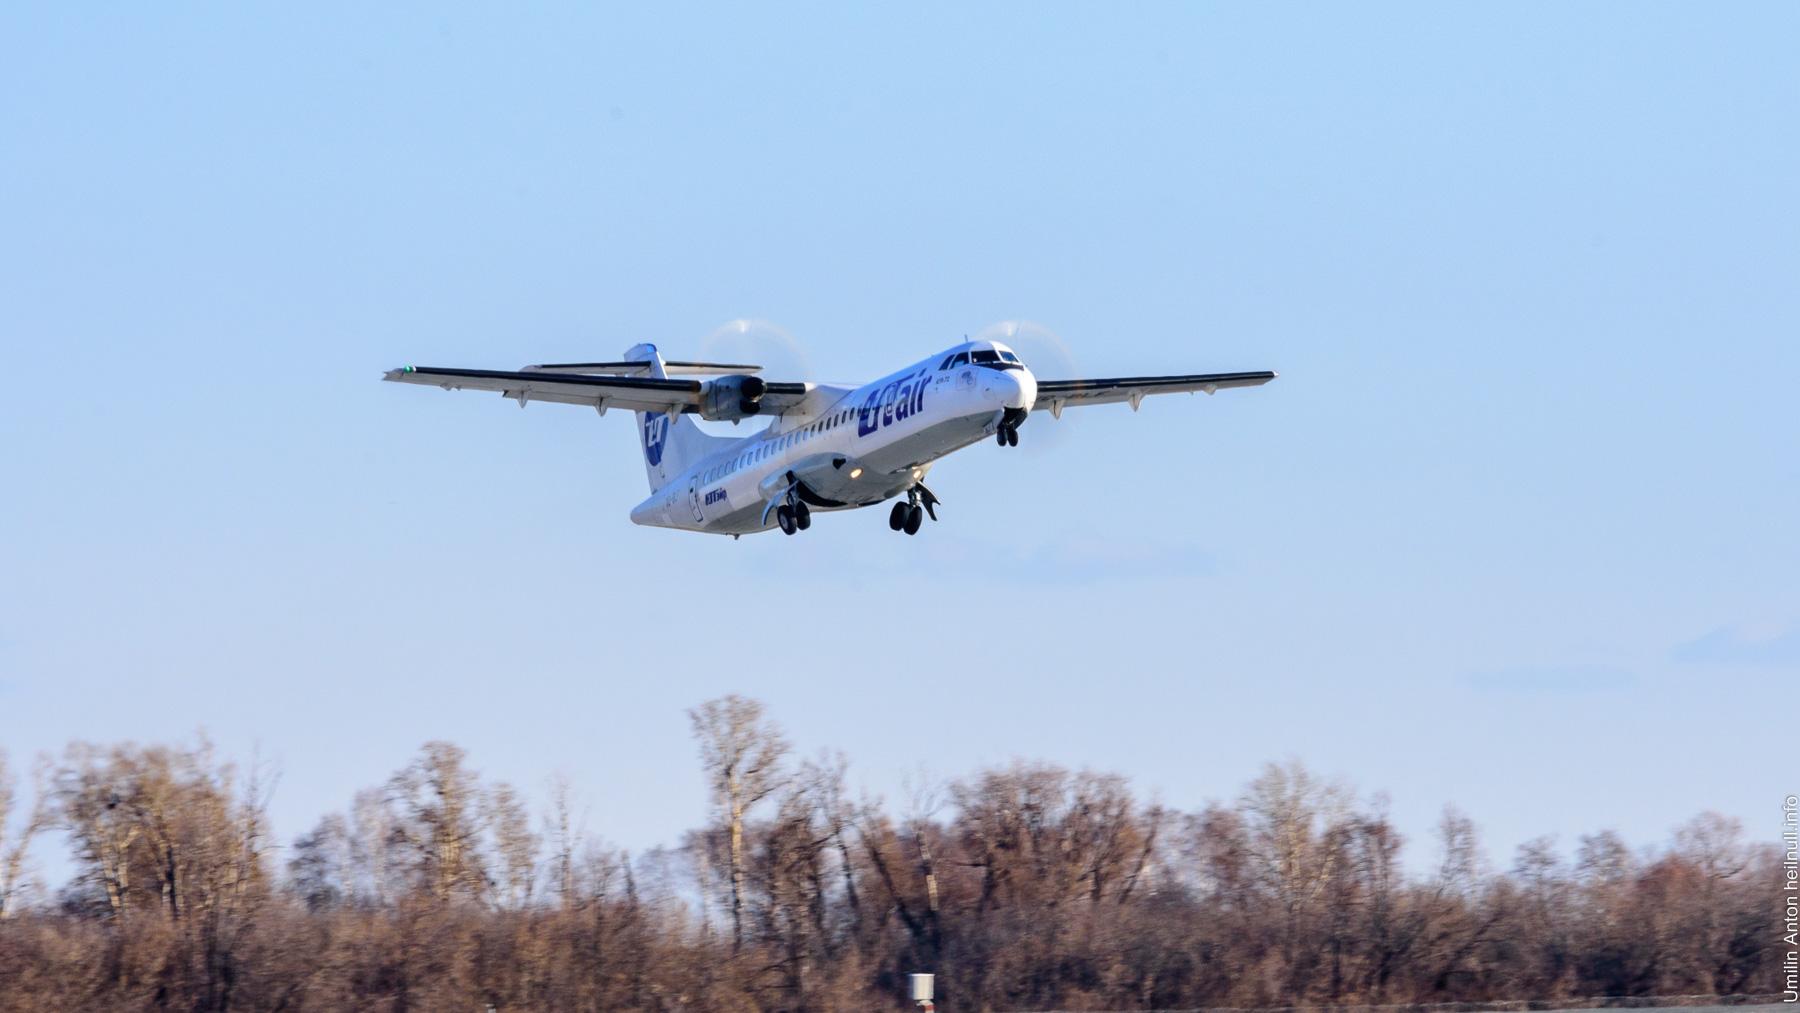 UAY_4344-7